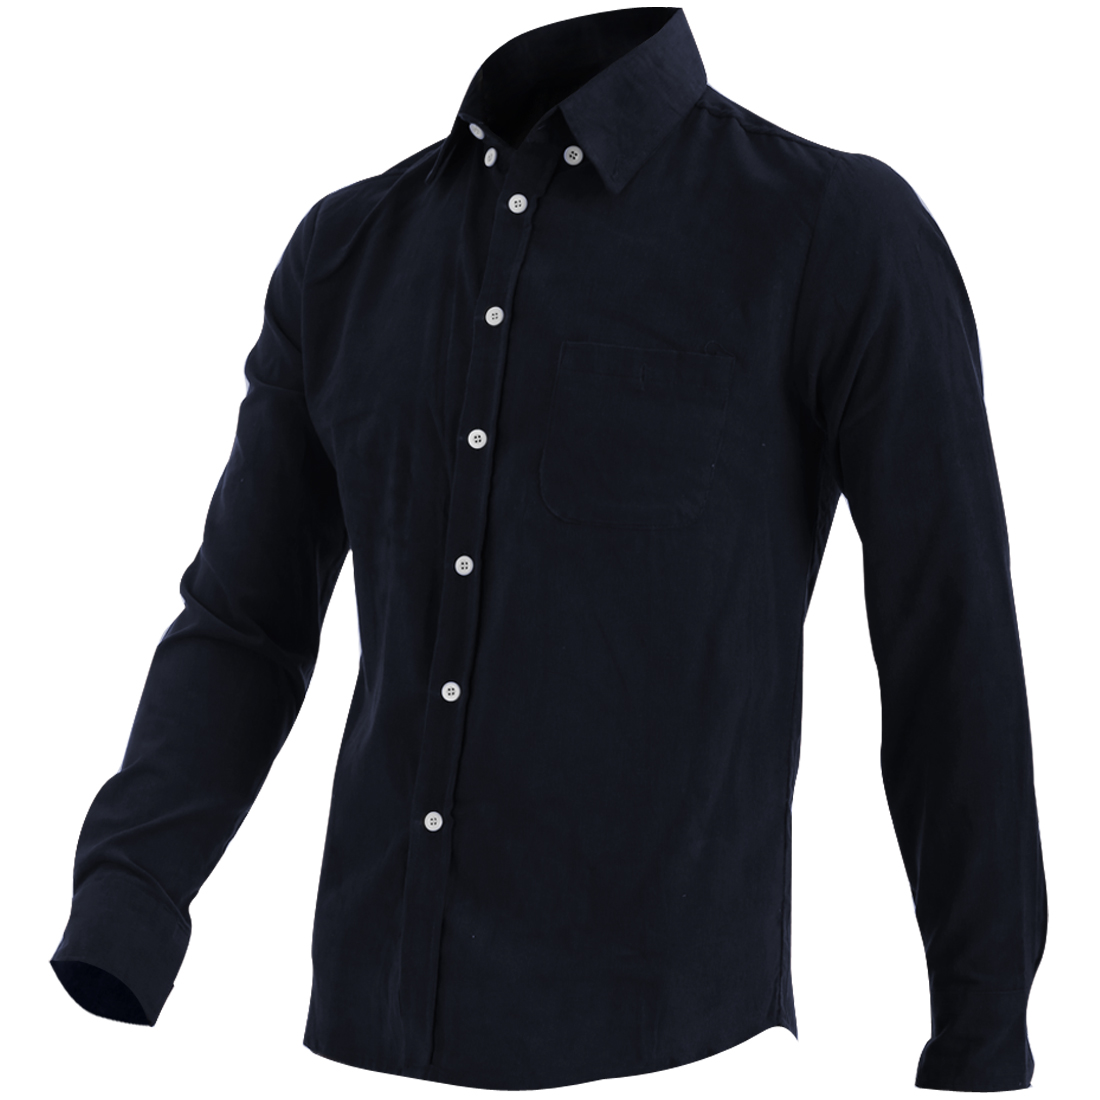 New Fashion Point Collar Long Sleeve Dark Blue Corduroy Shirt M for Man